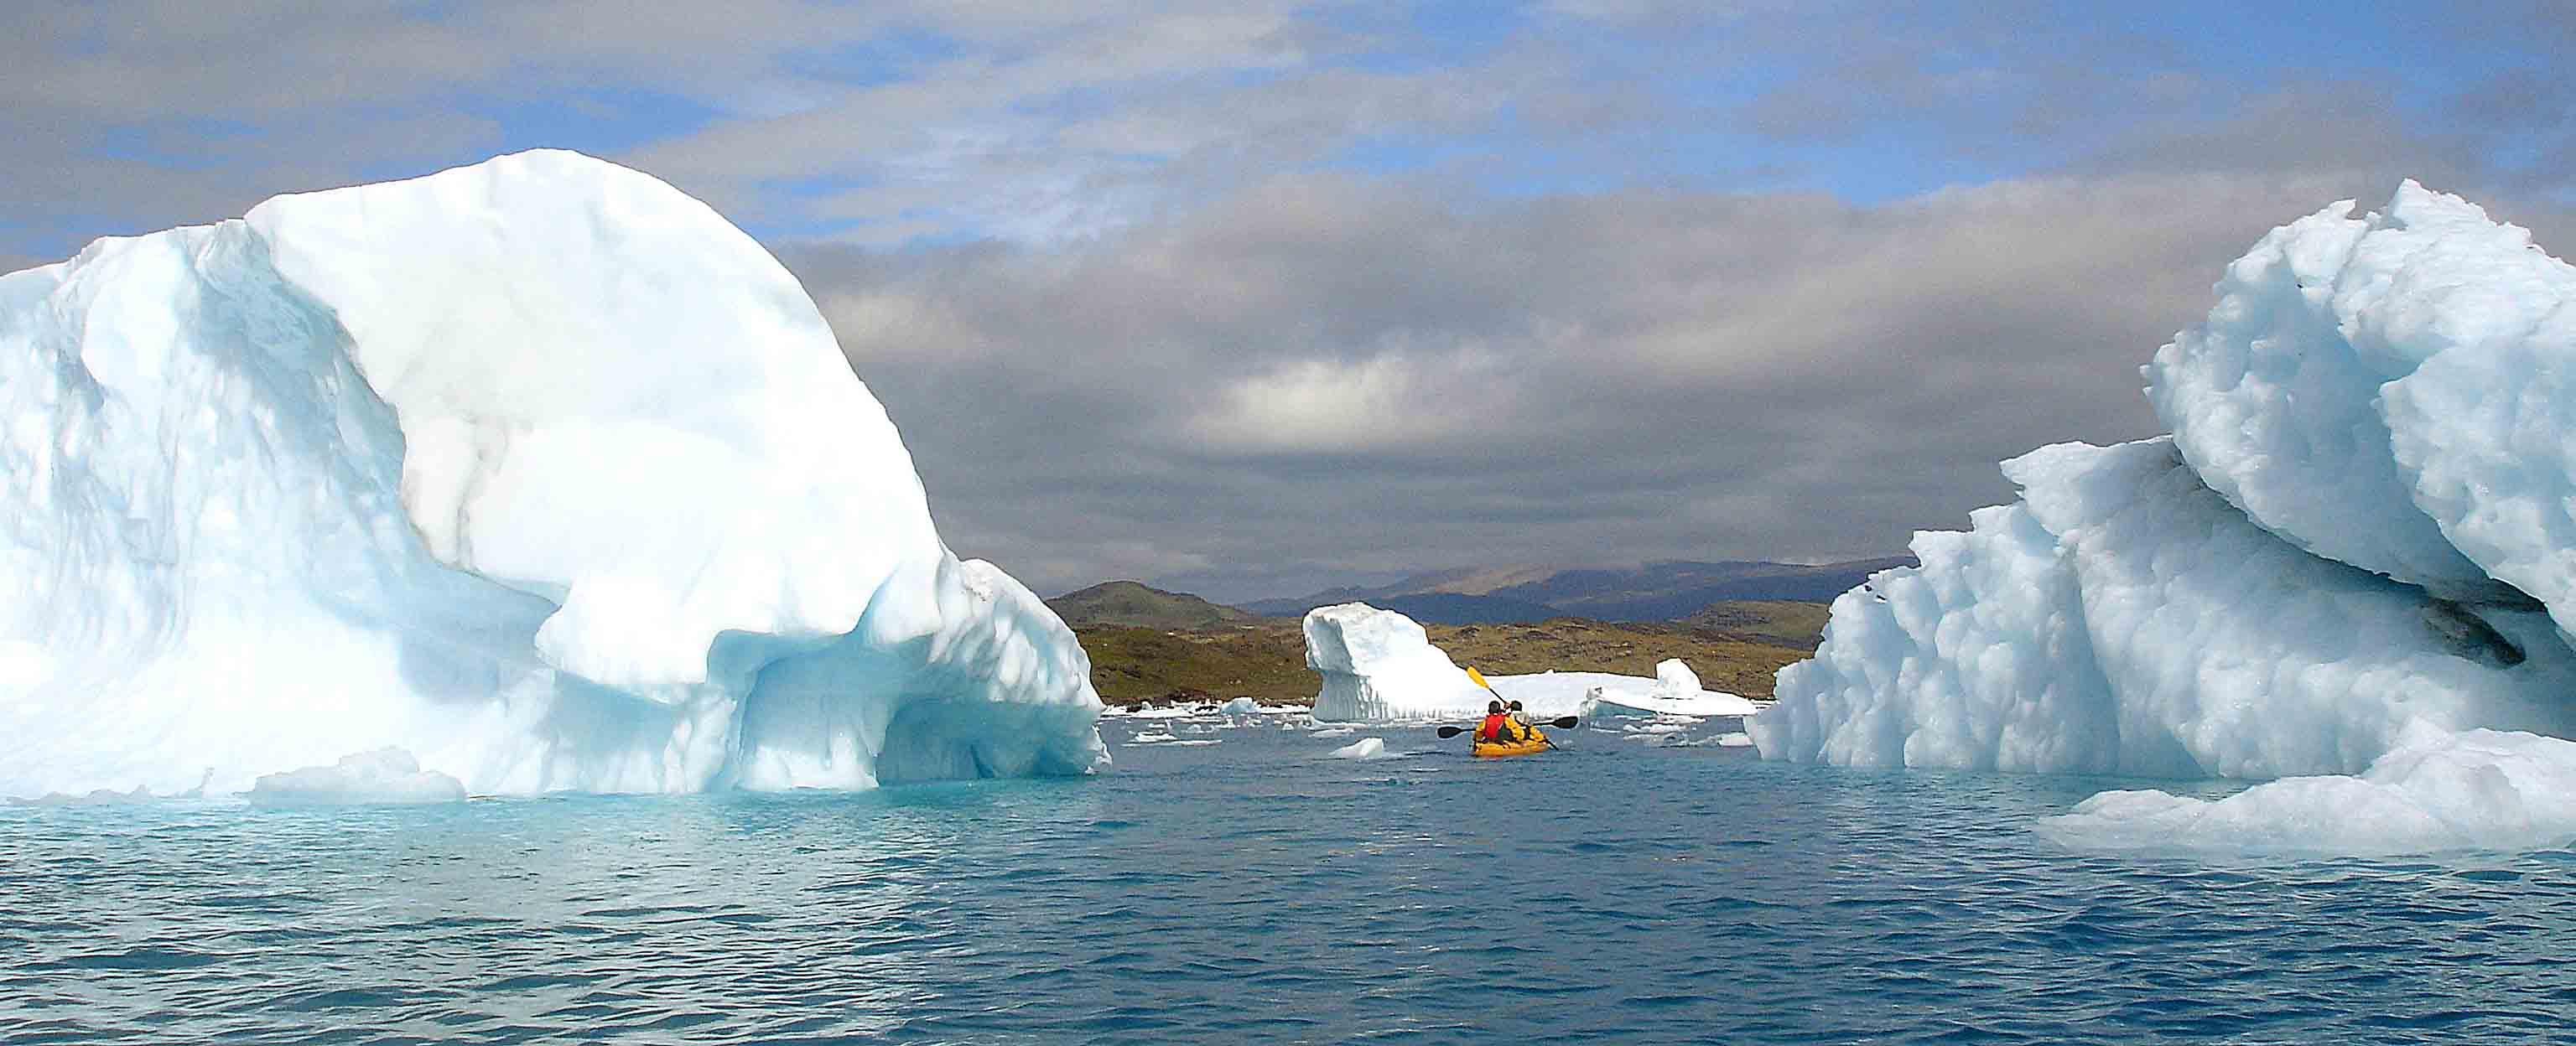 Kayaking Trips In Greenland Narsaq Area